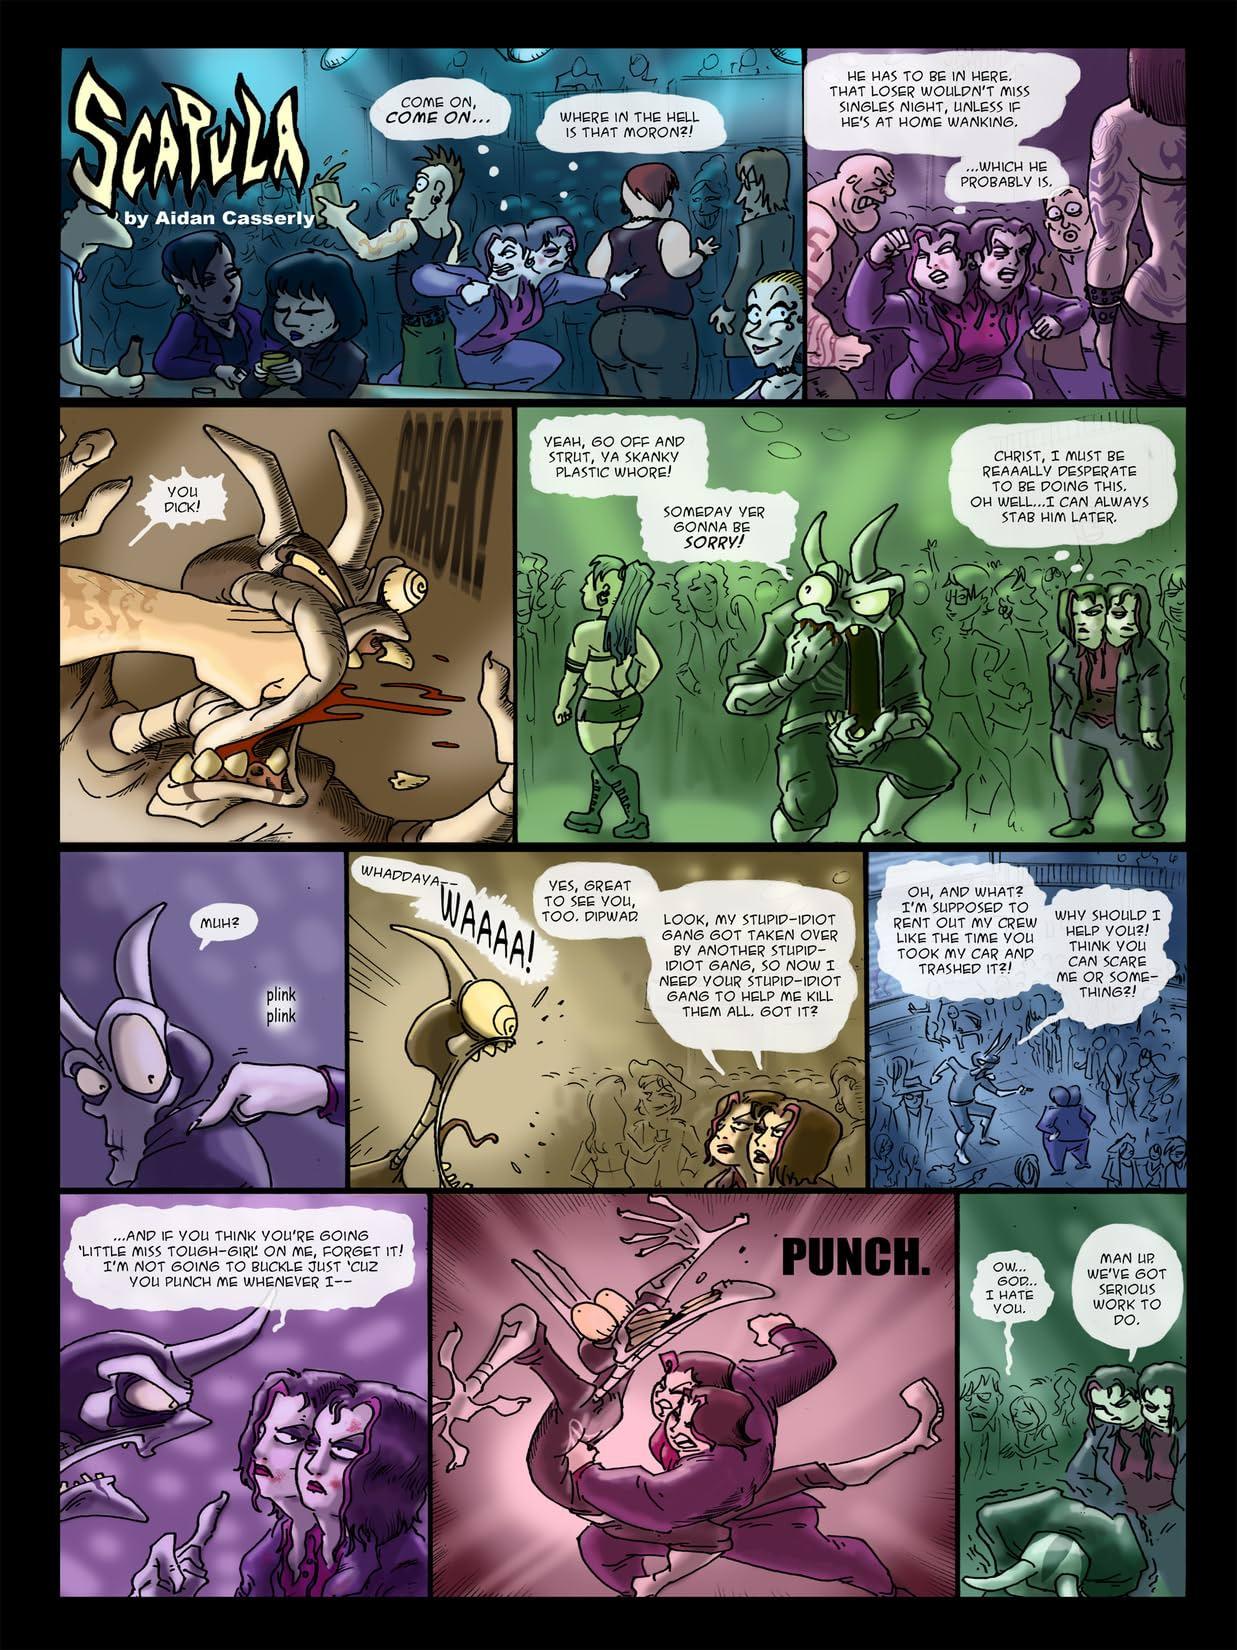 Scapula: The Sunday Comics